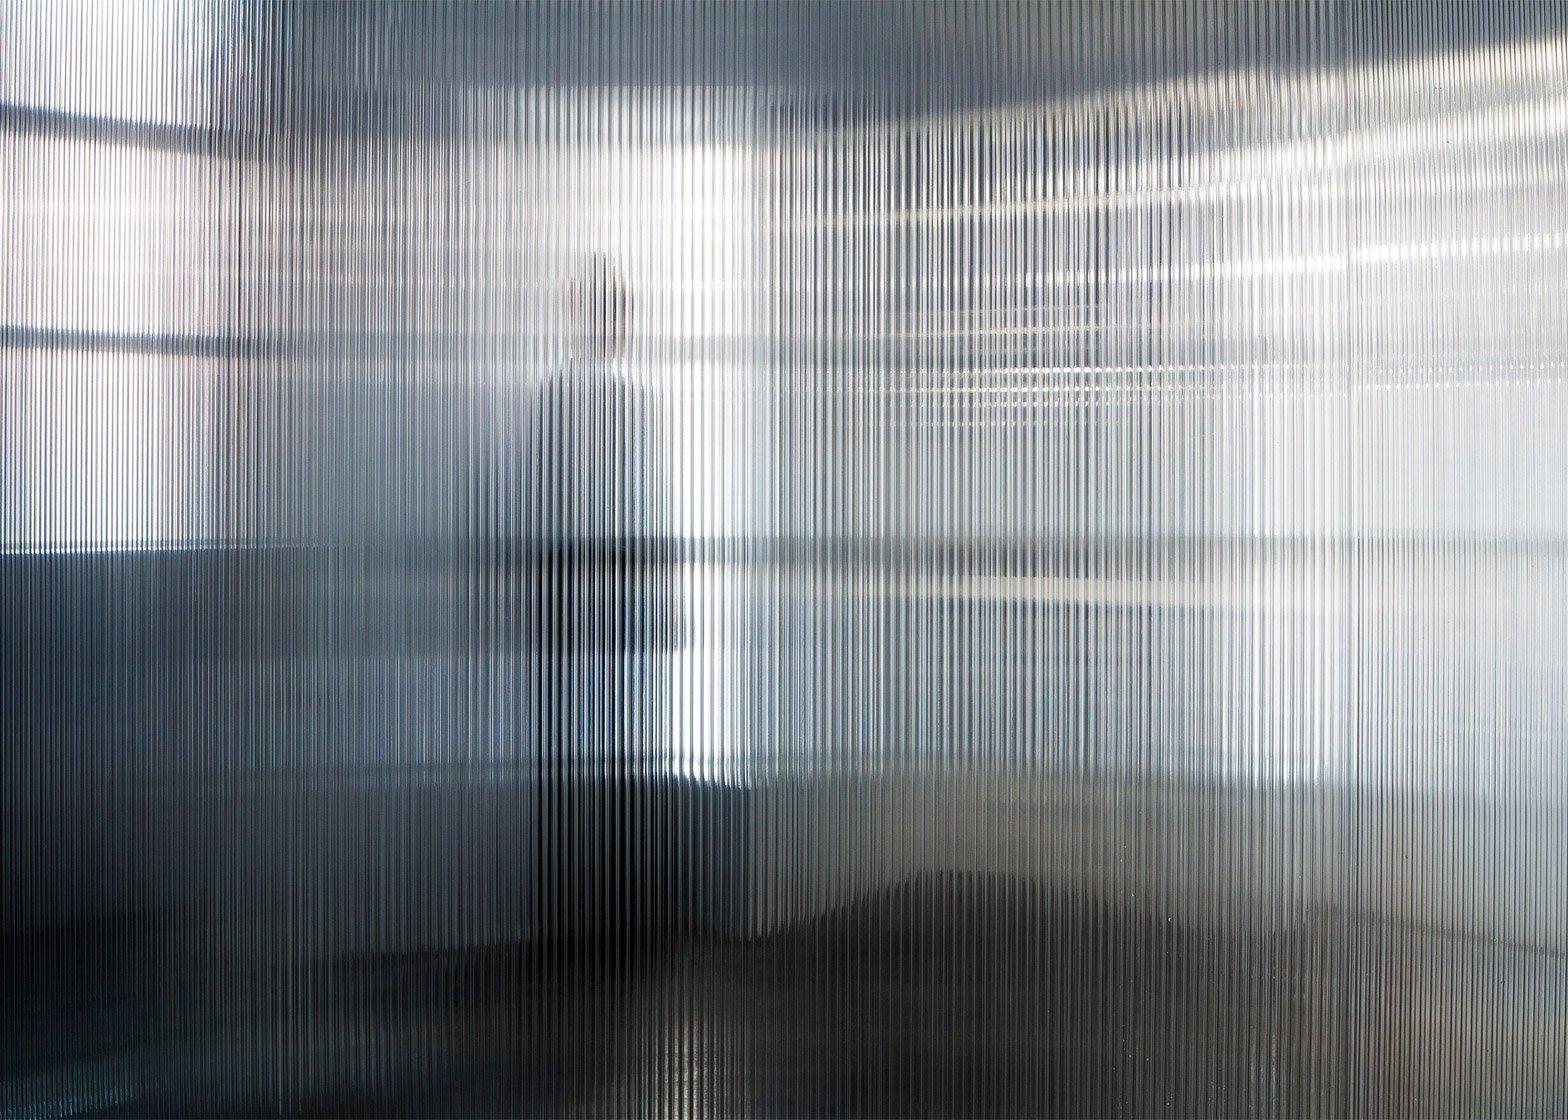 El Bulli by Ferran Adrià